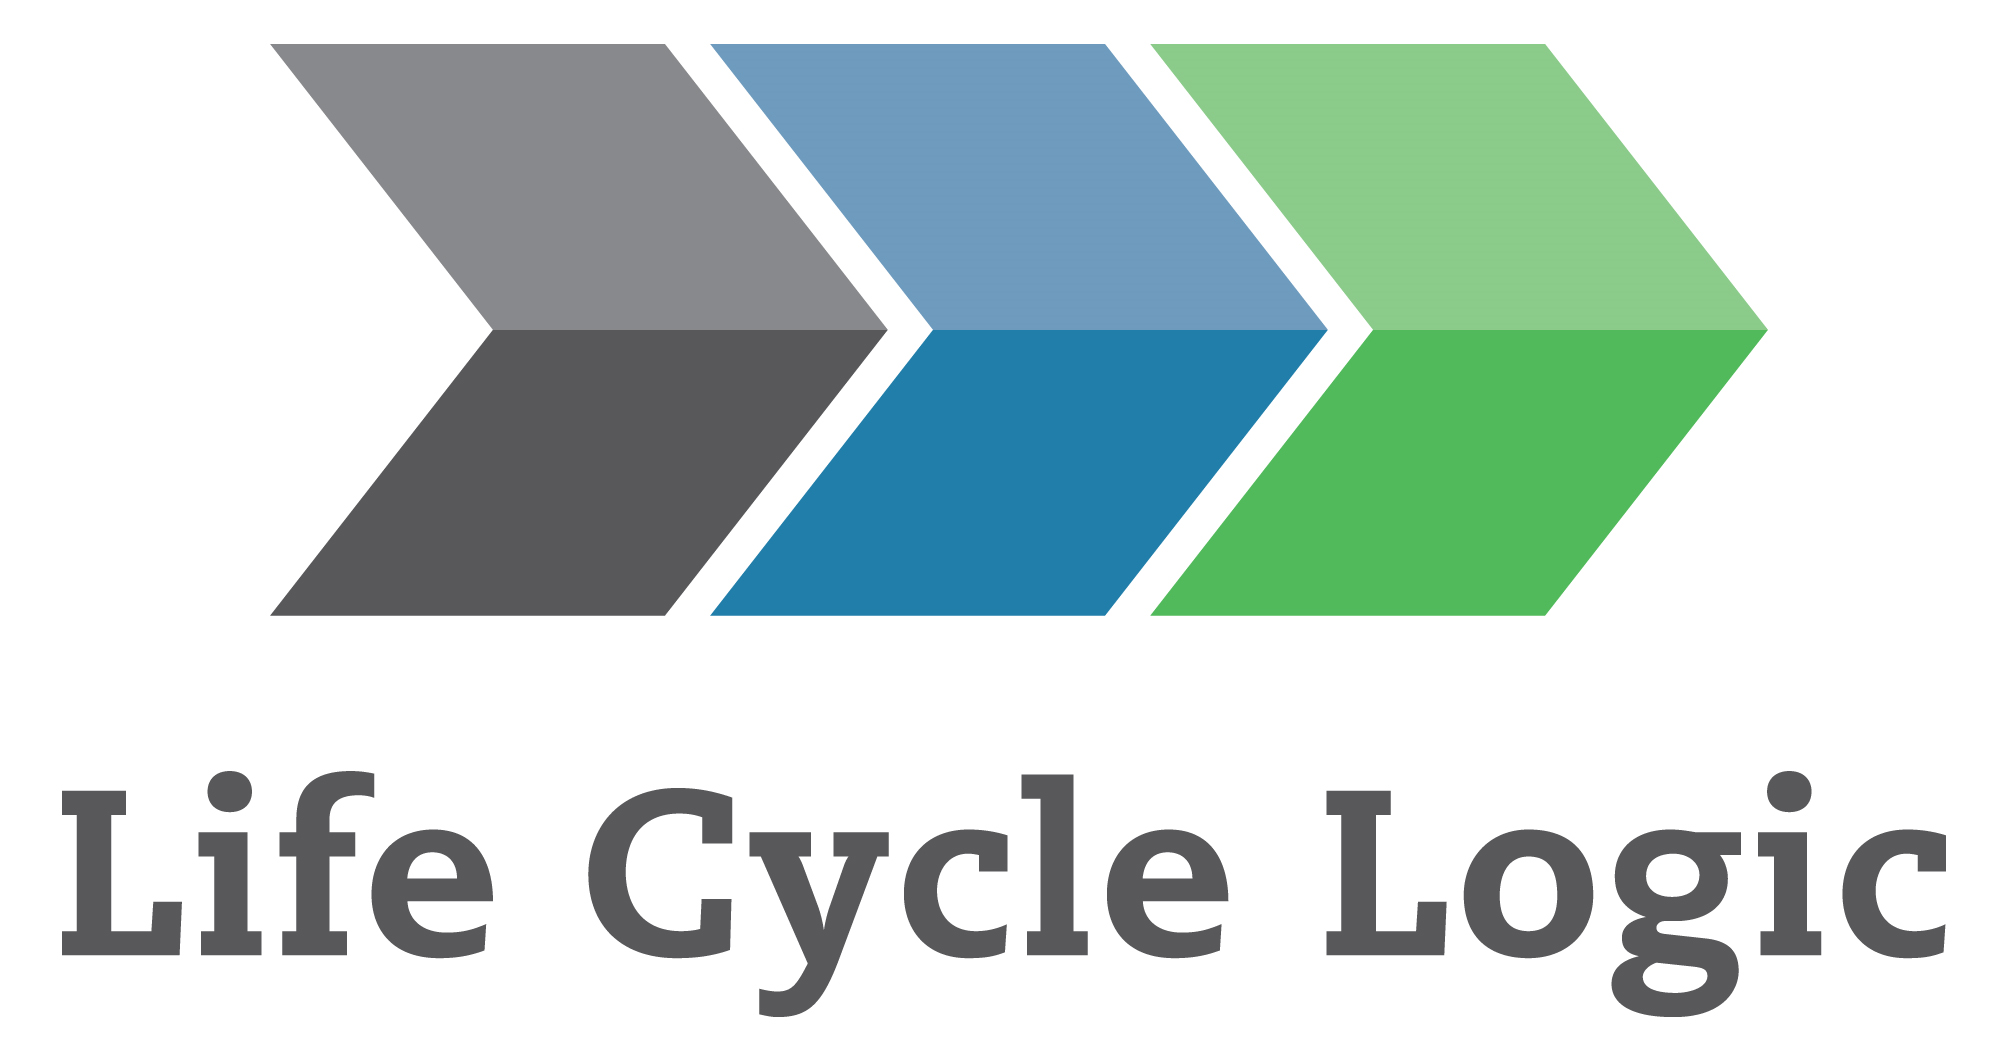 Life Cycle Logic